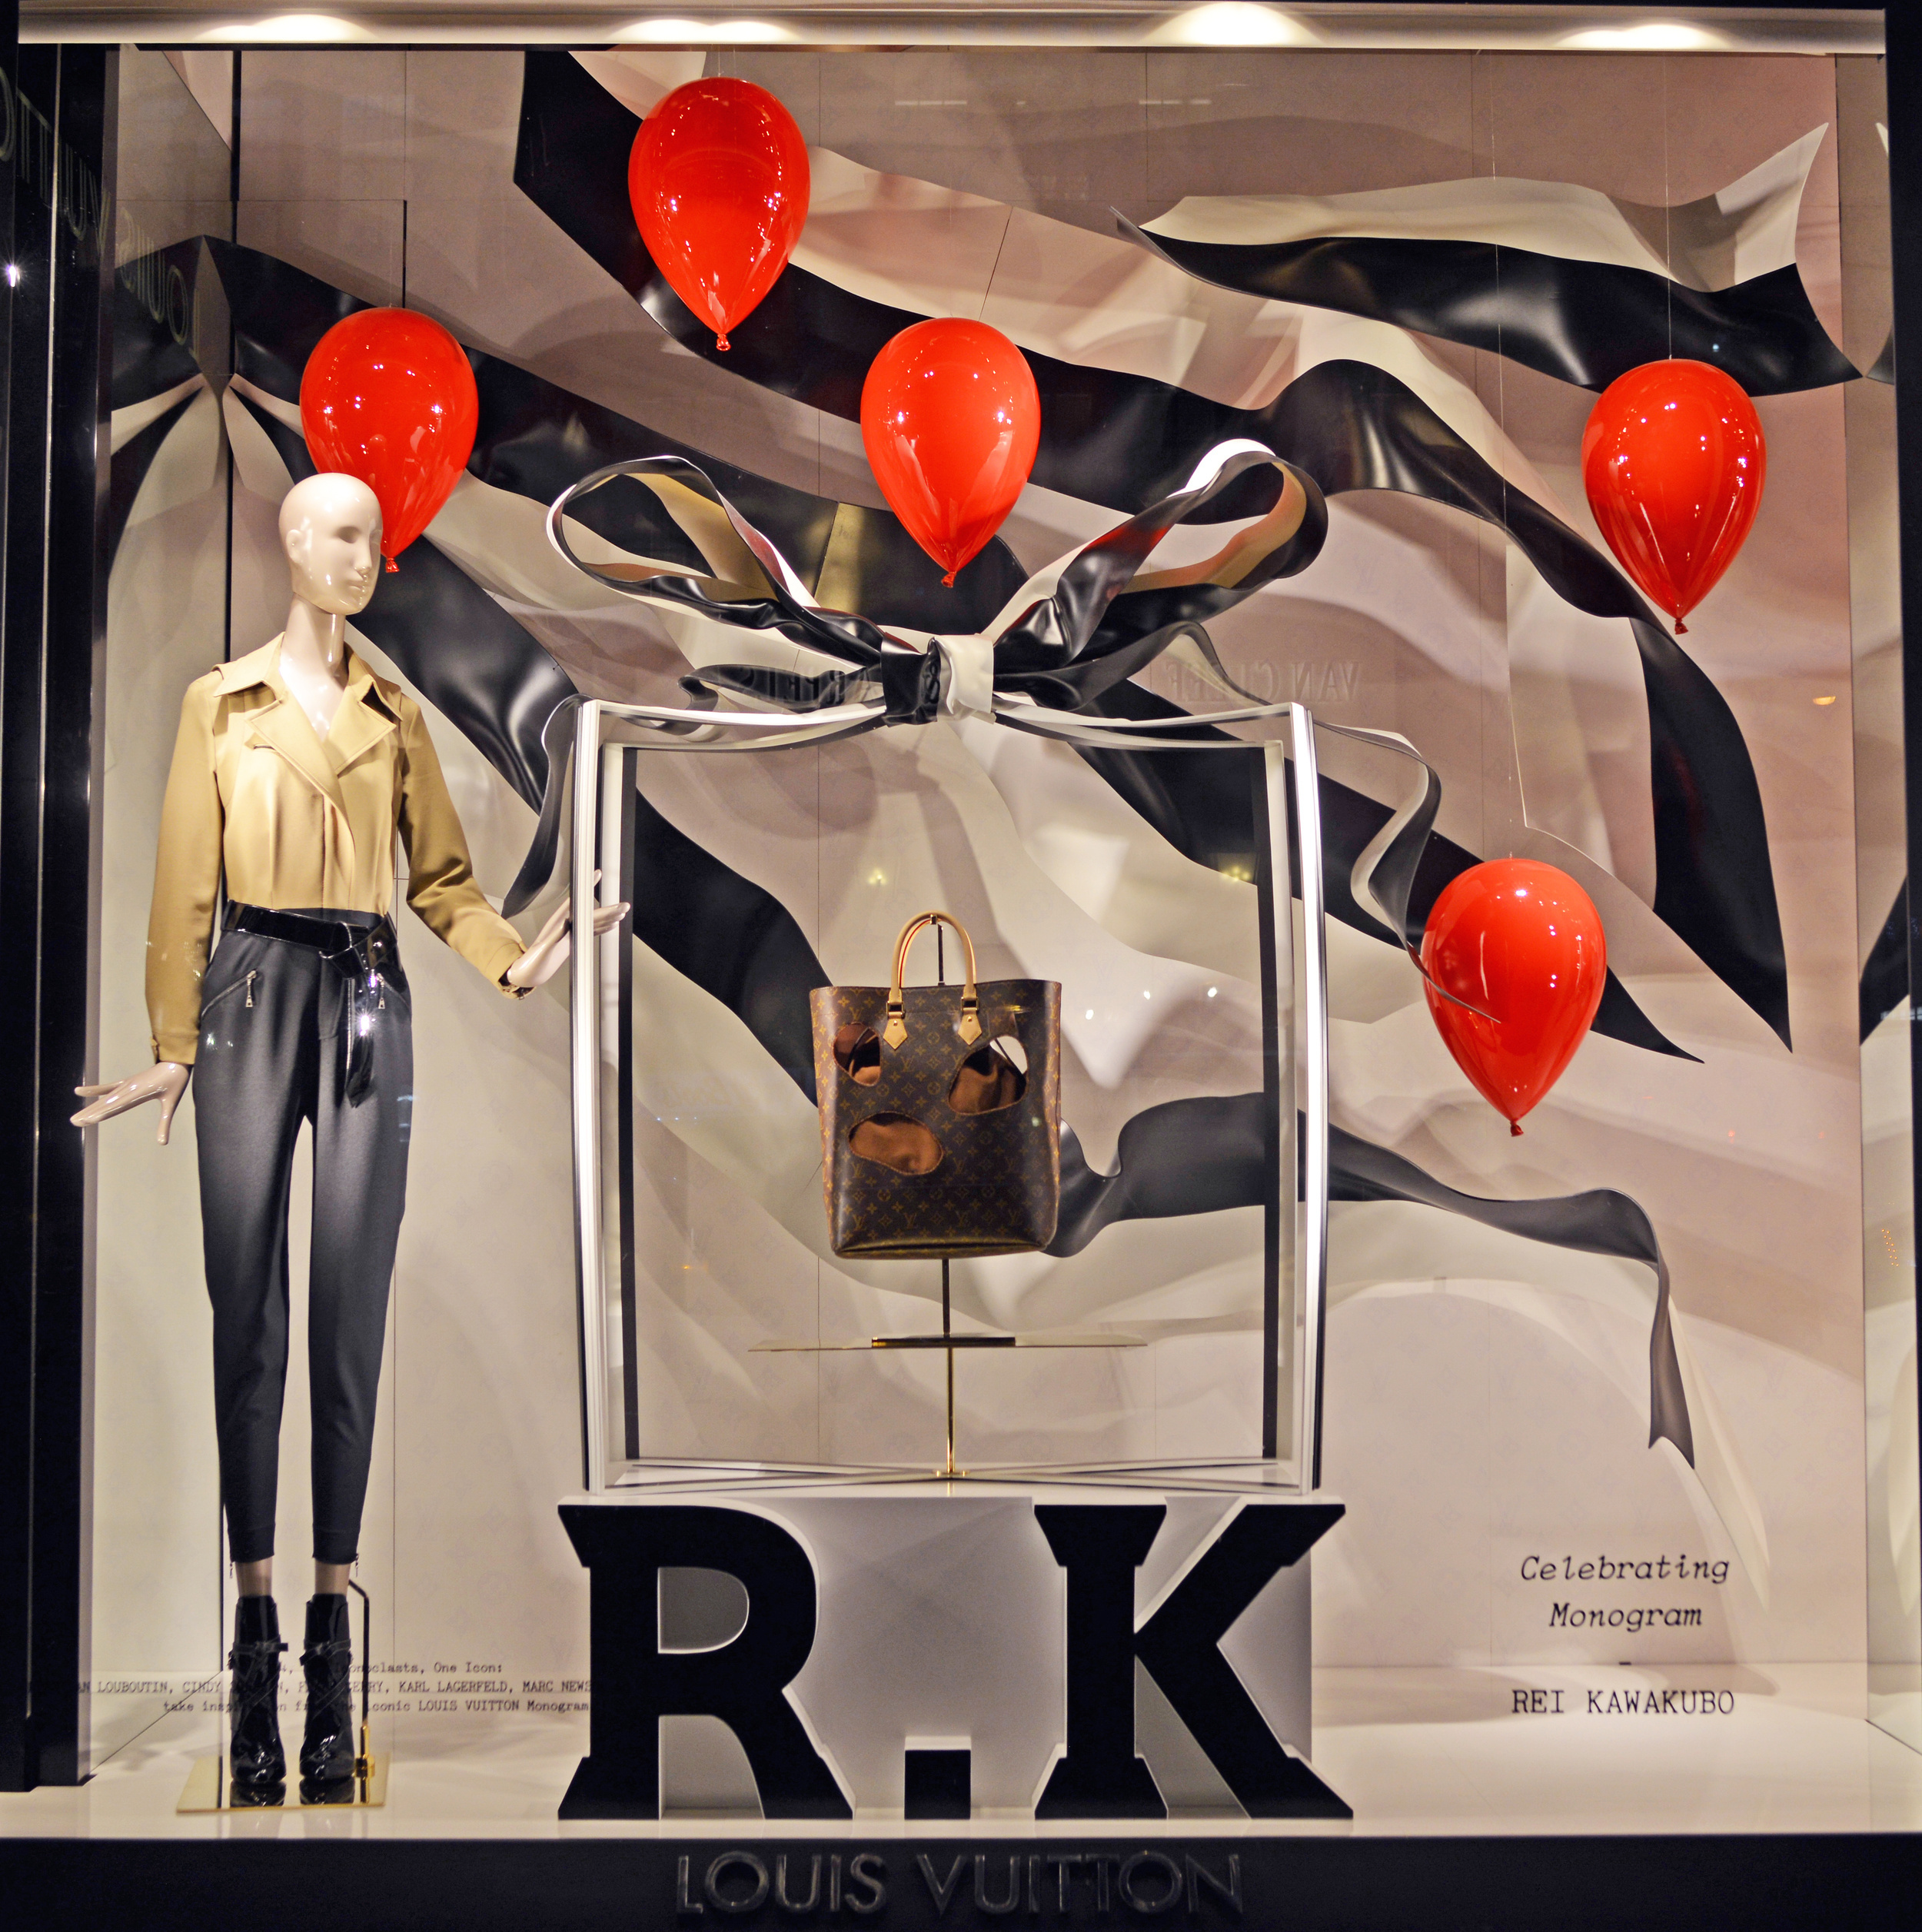 Window Display for Rei Kawakubo - Louis Vuitton